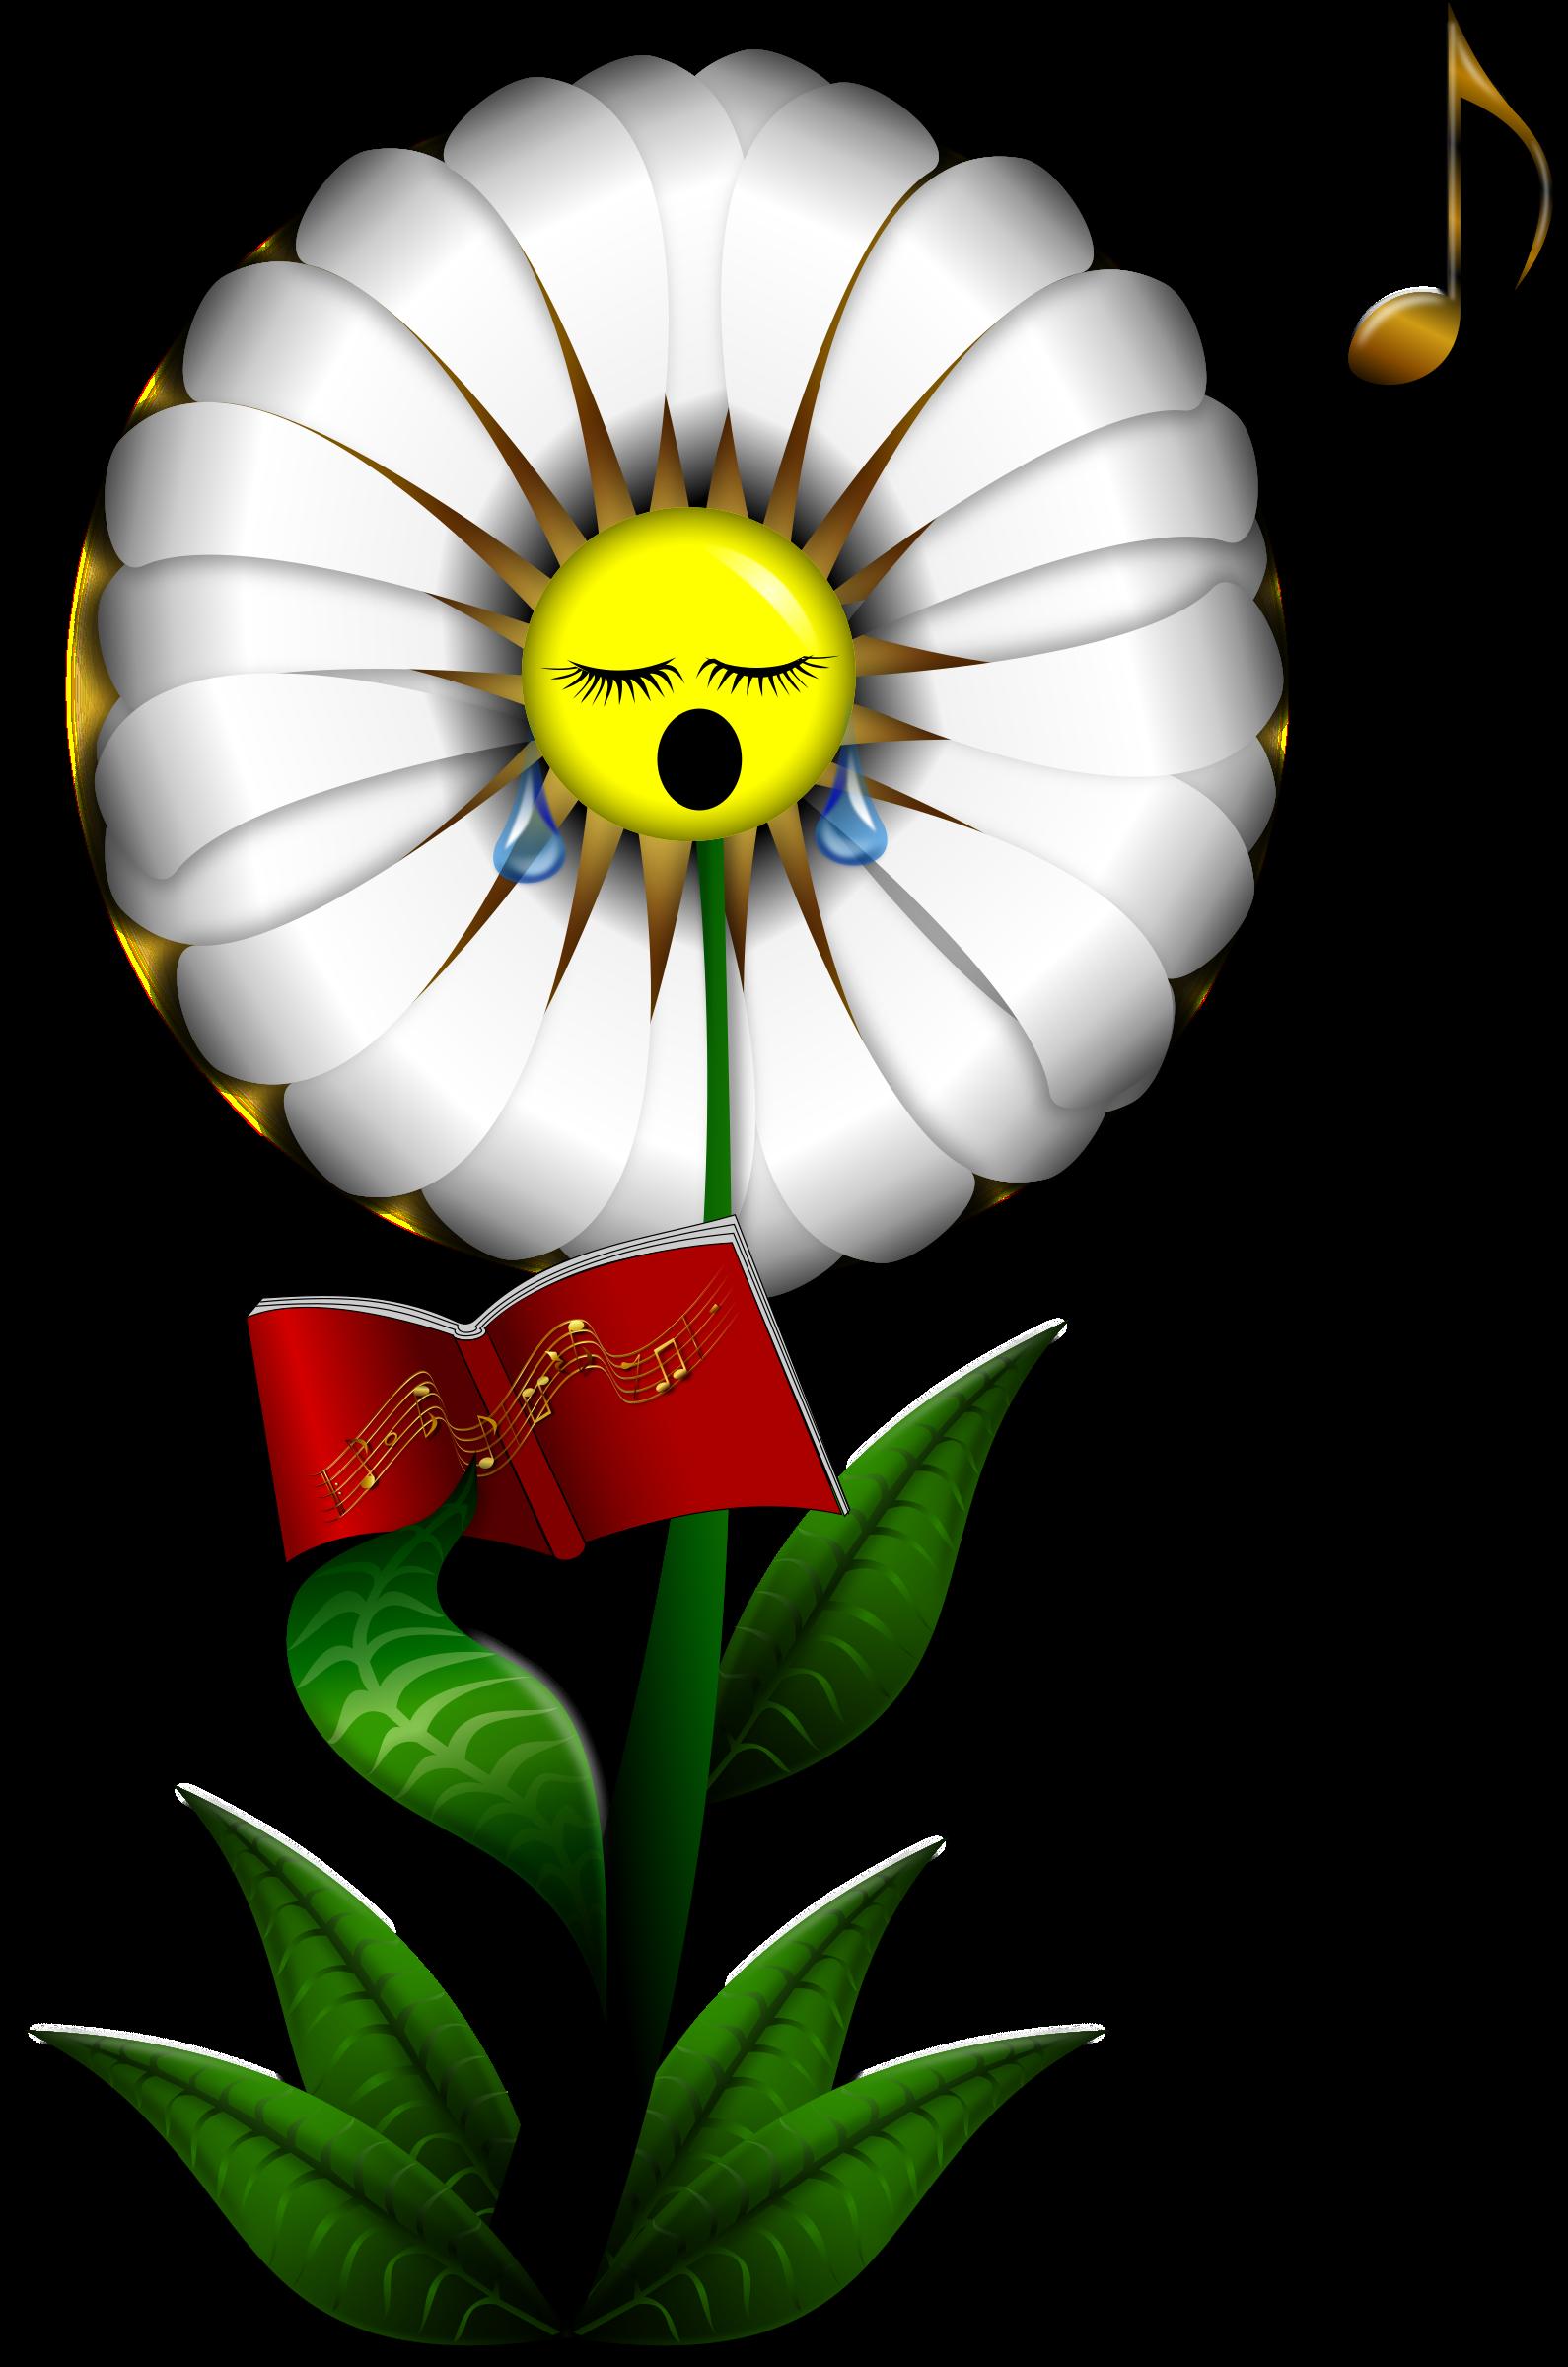 Music clipart flower. Singing daisy big image